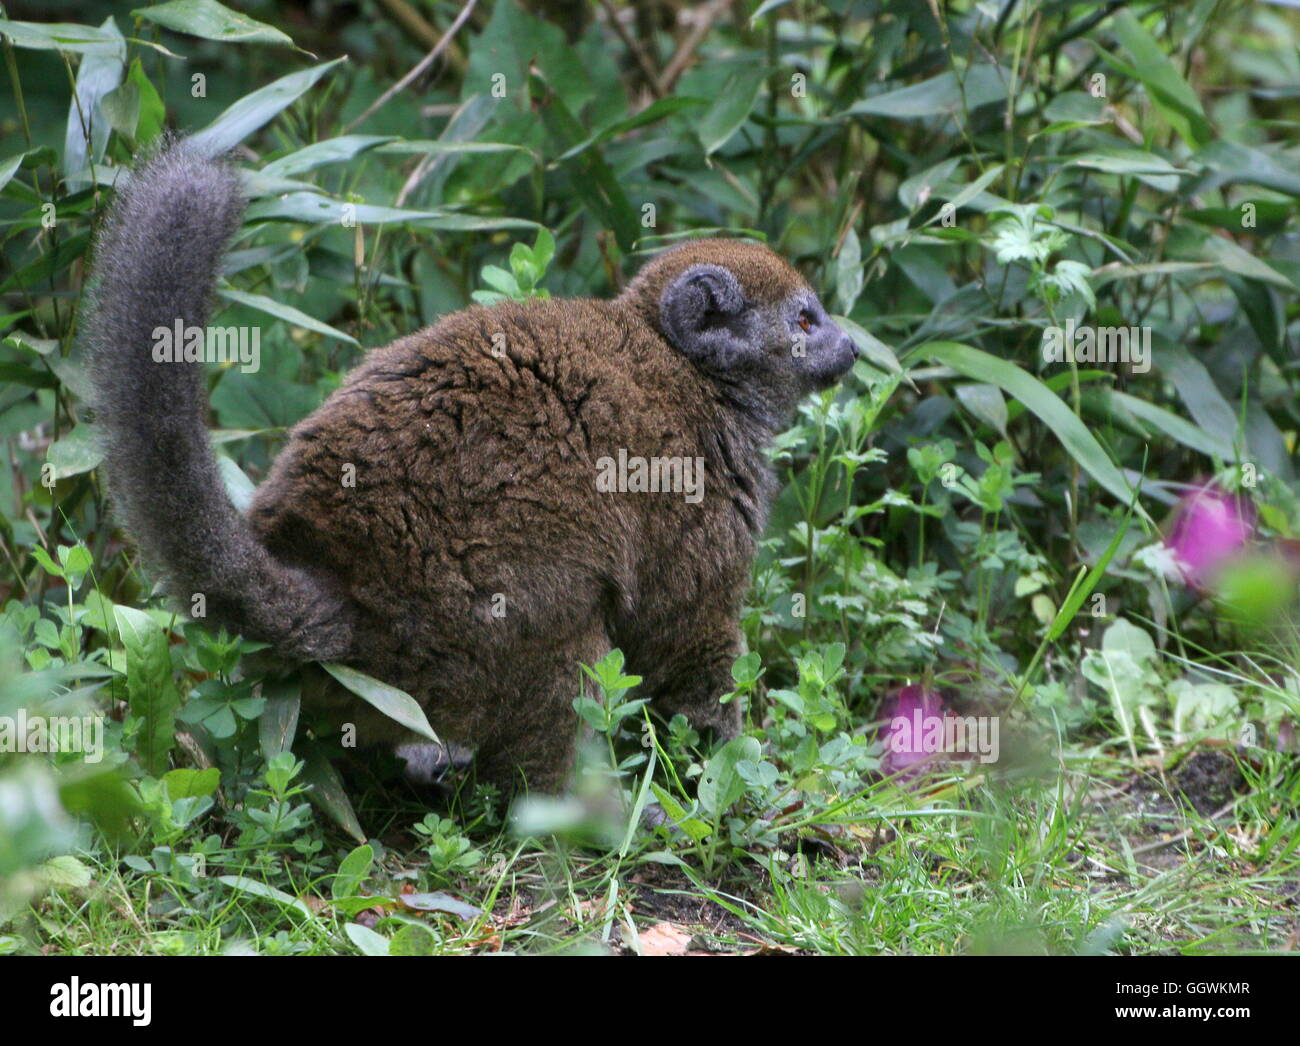 Female Madagascar Lac Alaotra bamboo lemur (Hapalemur alaotrensis), walking on  the ground. A.k.a.  Alaotran gentle - Stock Image